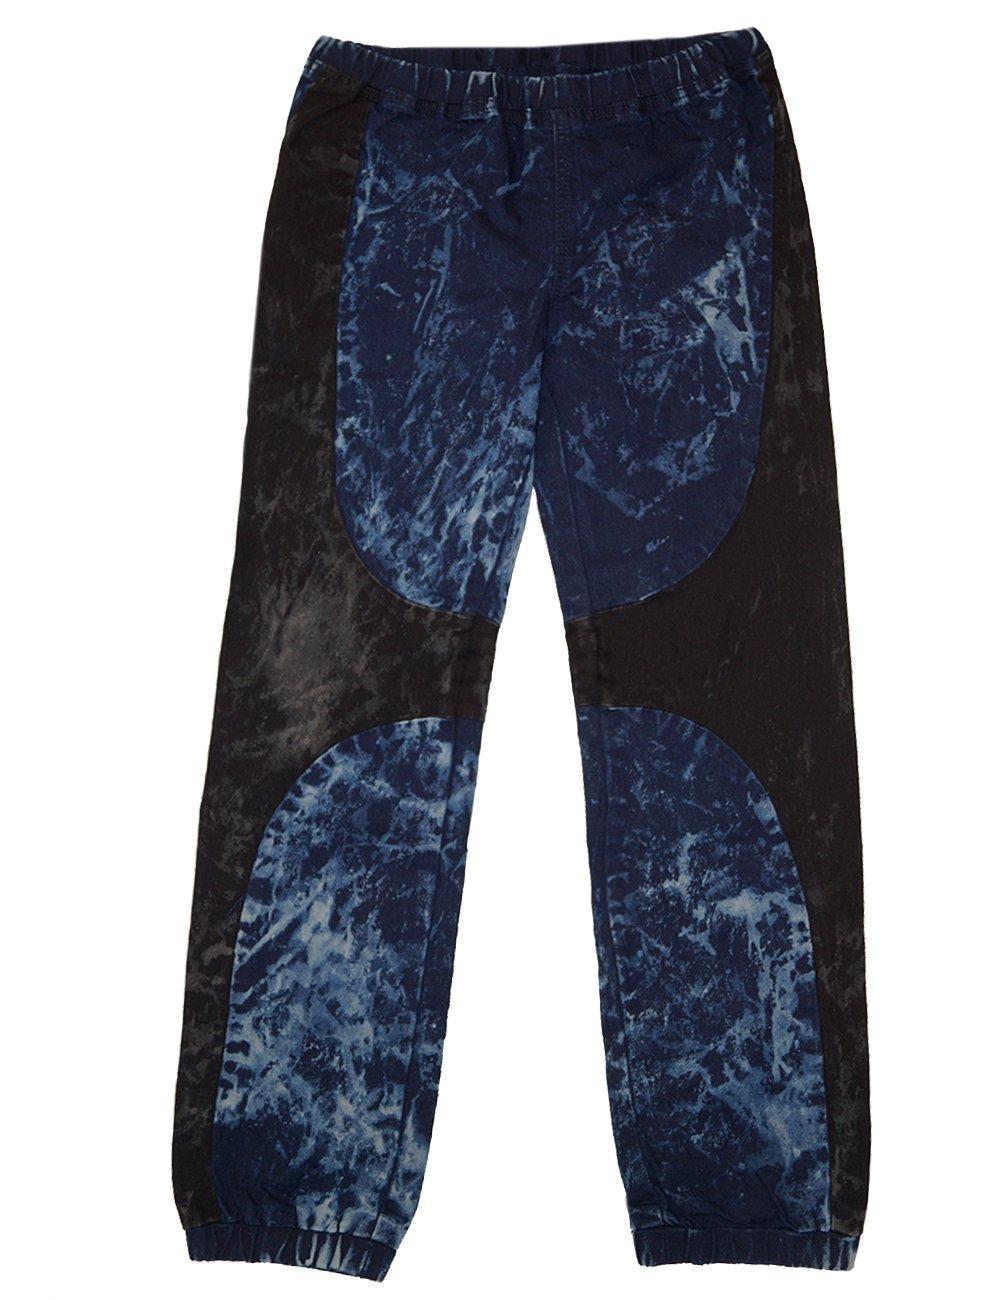 Crest Jeans Big Girls Black Stretchy Waist Ankle Cuff Denim Jeans 8-10